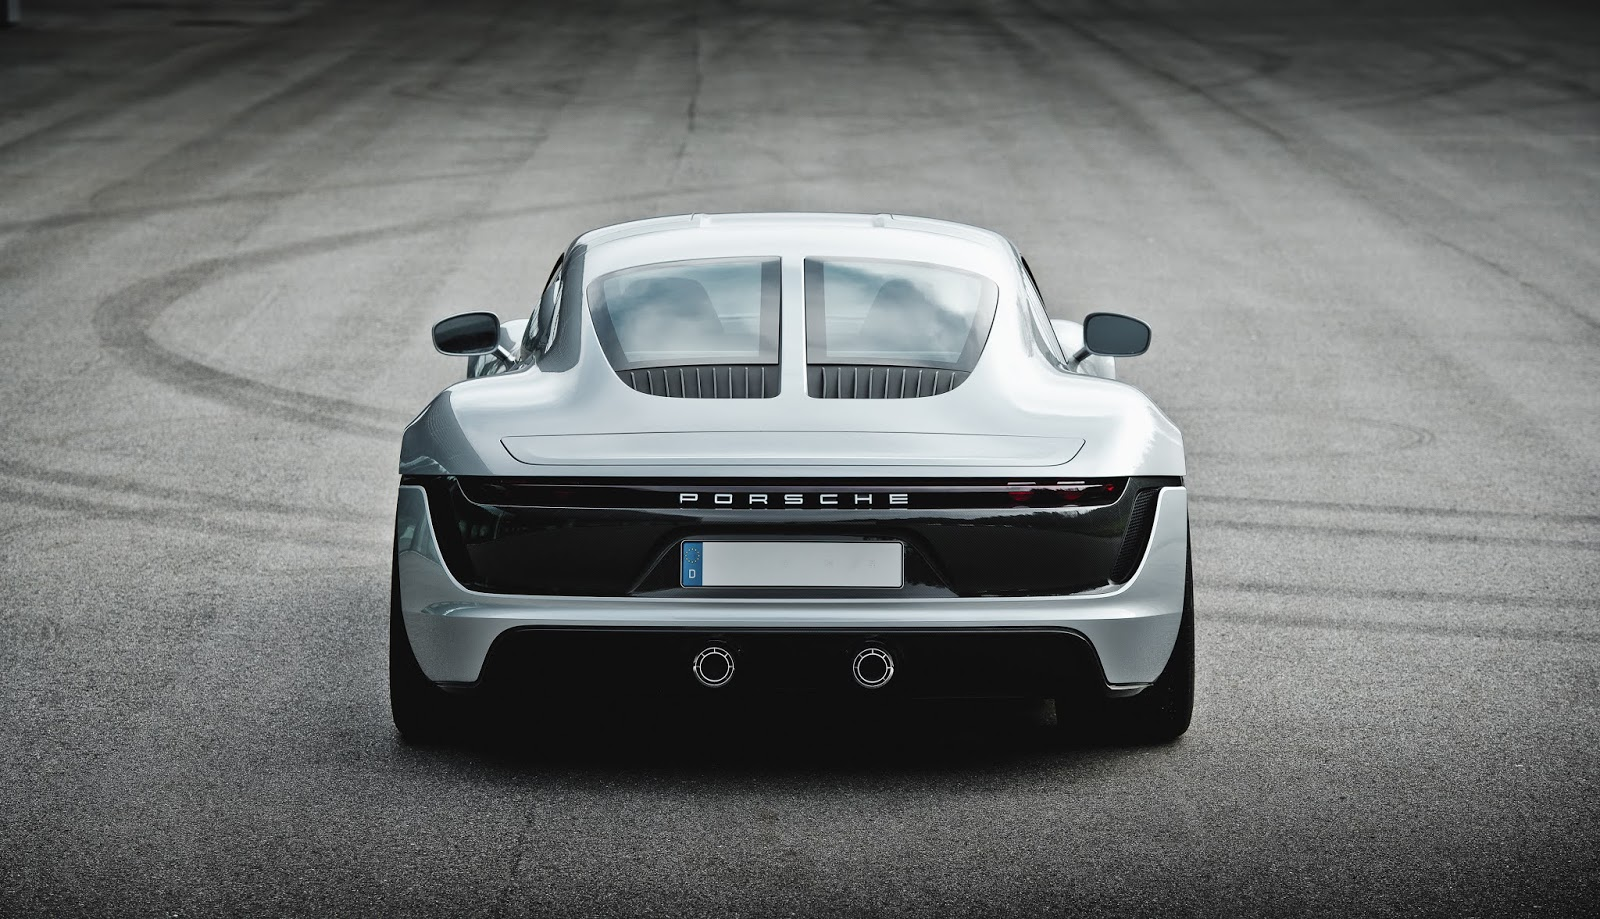 CVS0724 Le Mans Living Legend : Το πρωτότυπο που γέννησε την 718 Cayman GT4 LE MANS, Porsche, Porsche Le Mans, Porsche Unseen, sportscar, supercar, supercars, zblog, ειδήσεις